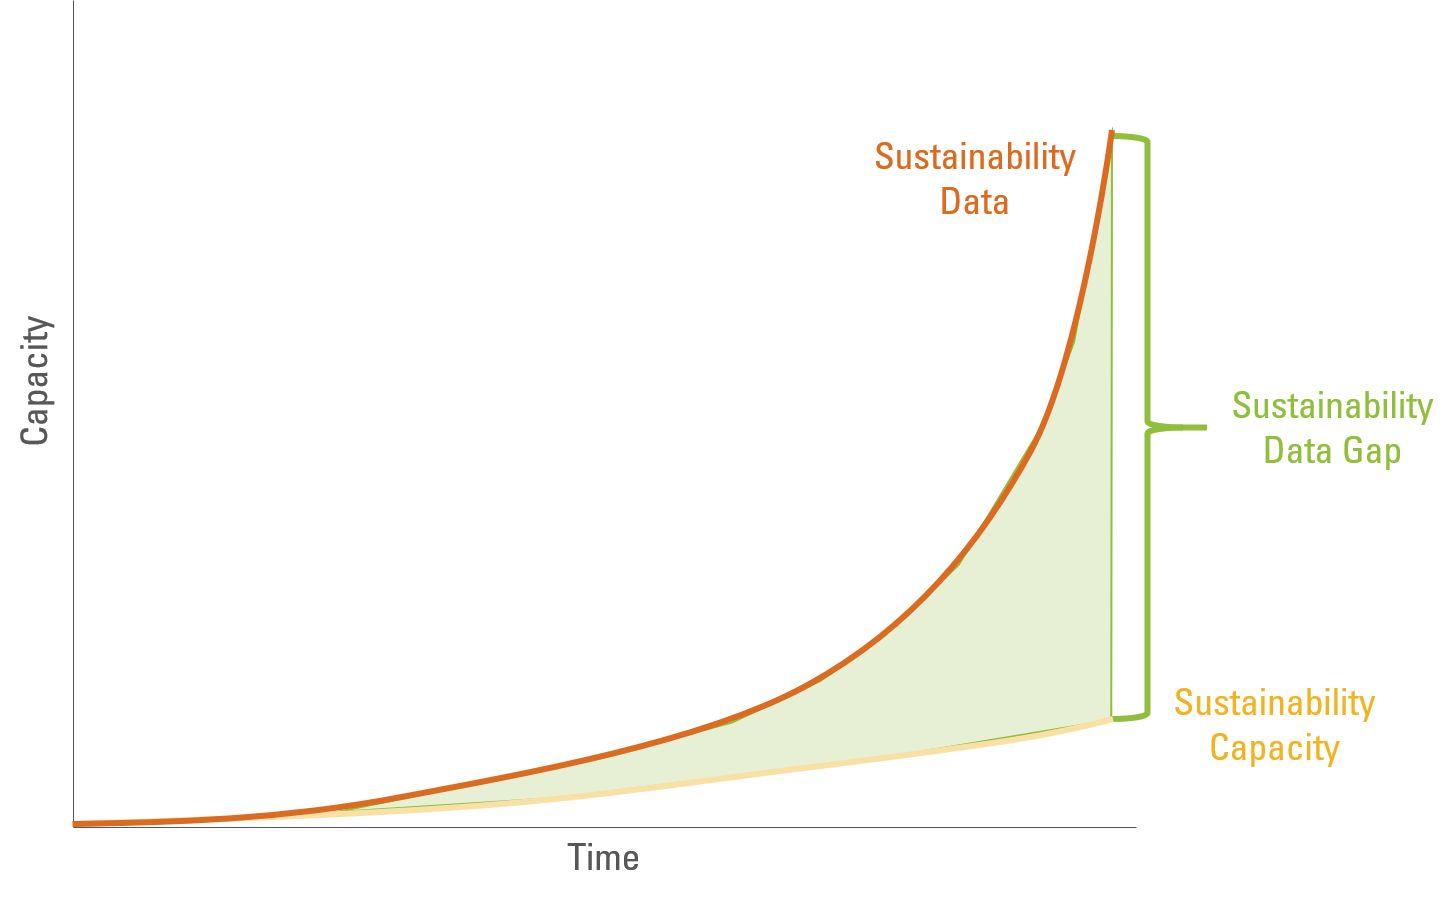 Sustainability Data Gap